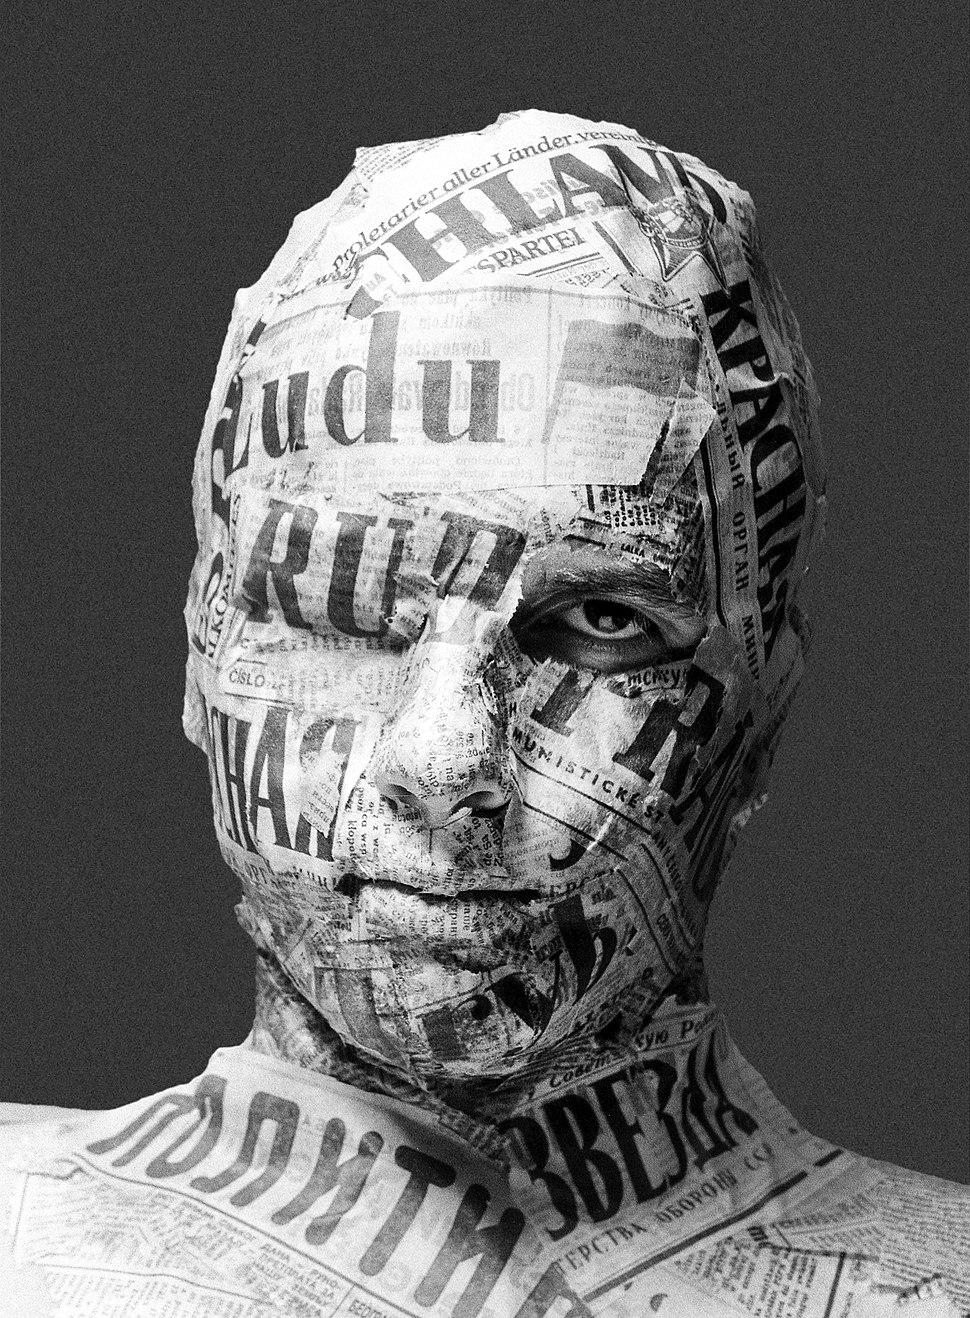 2014 Cenzura